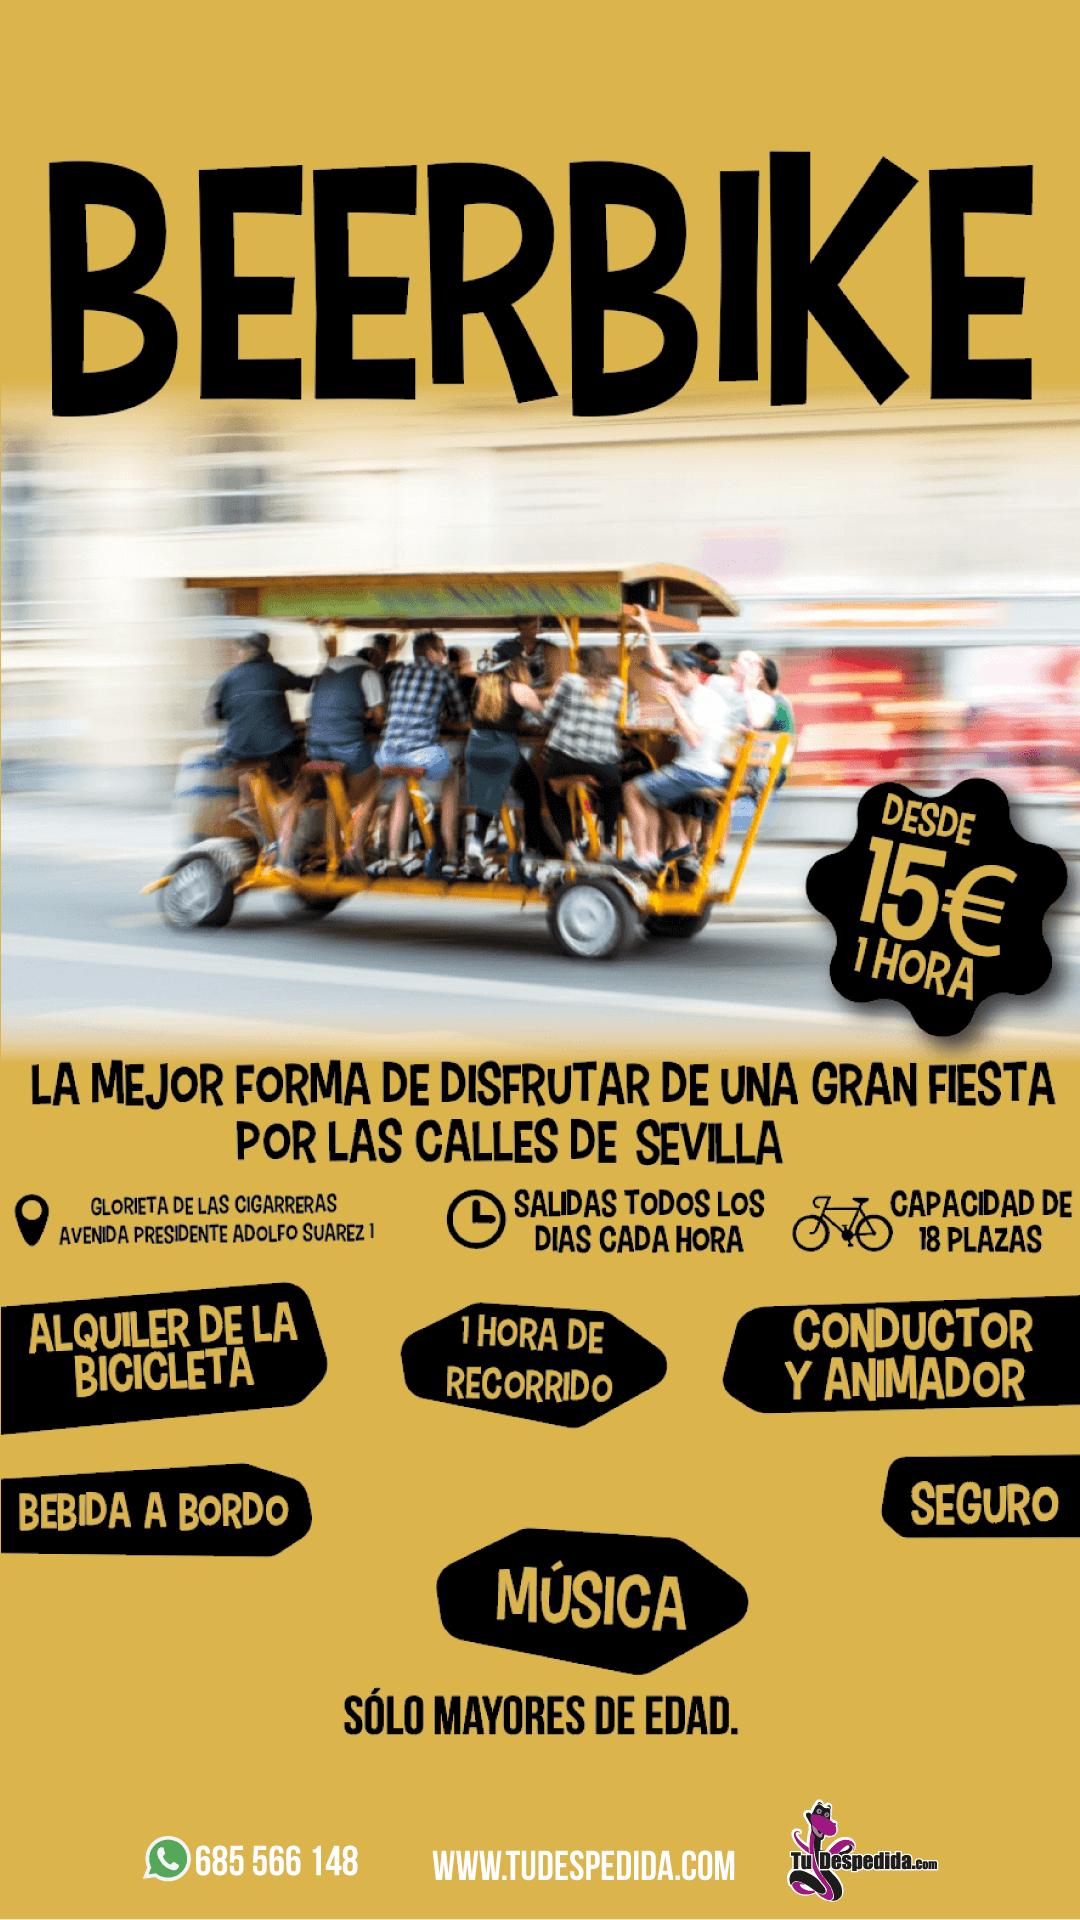 Beerbike Sevilla